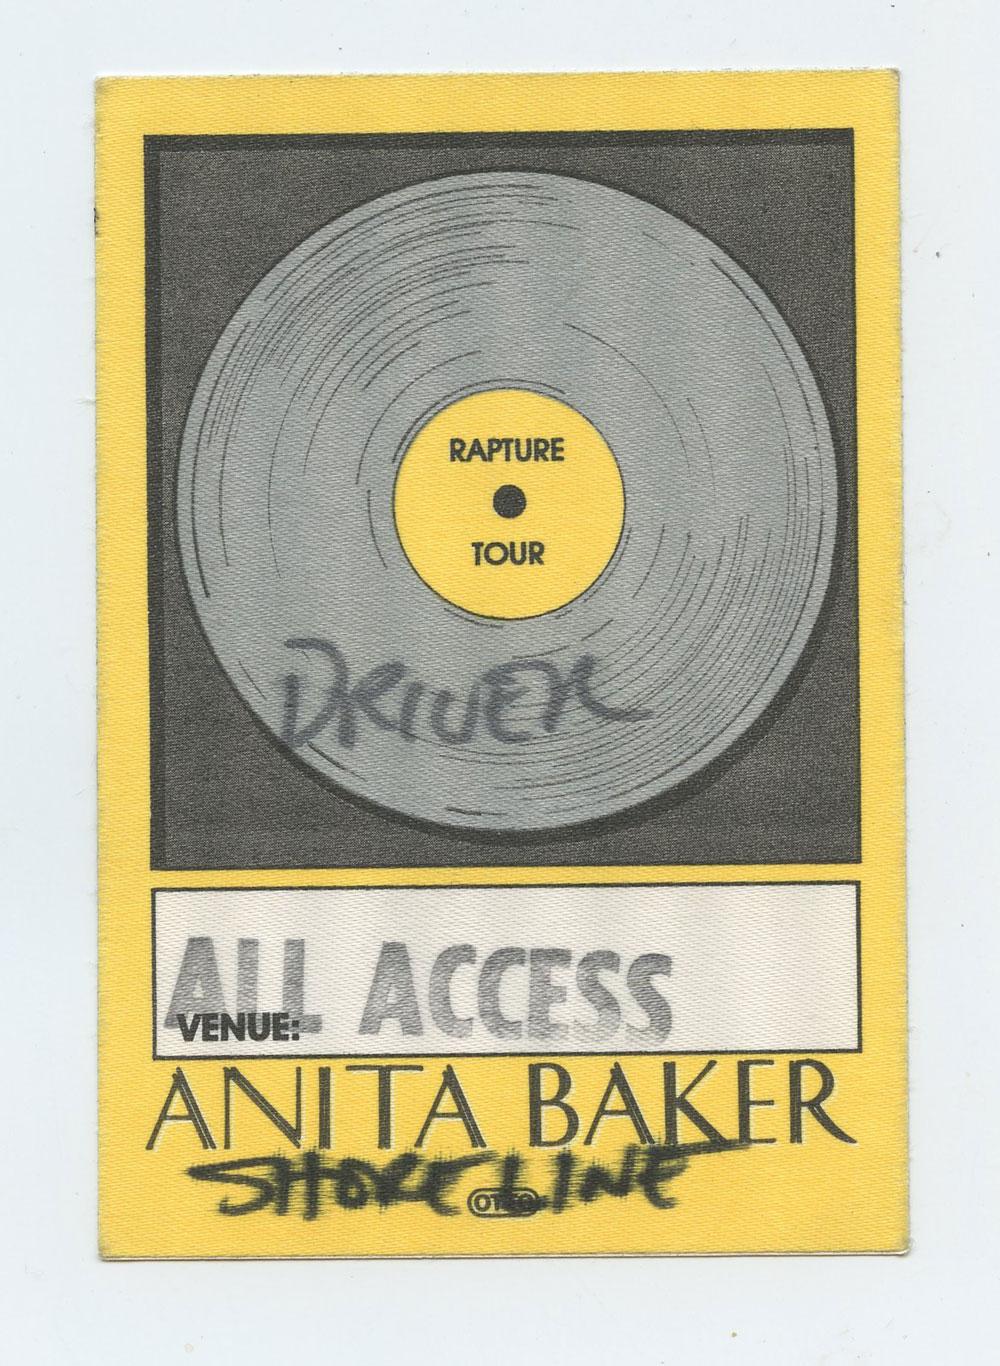 Anita Baker Backstage Pass 1986 Rapture Tour